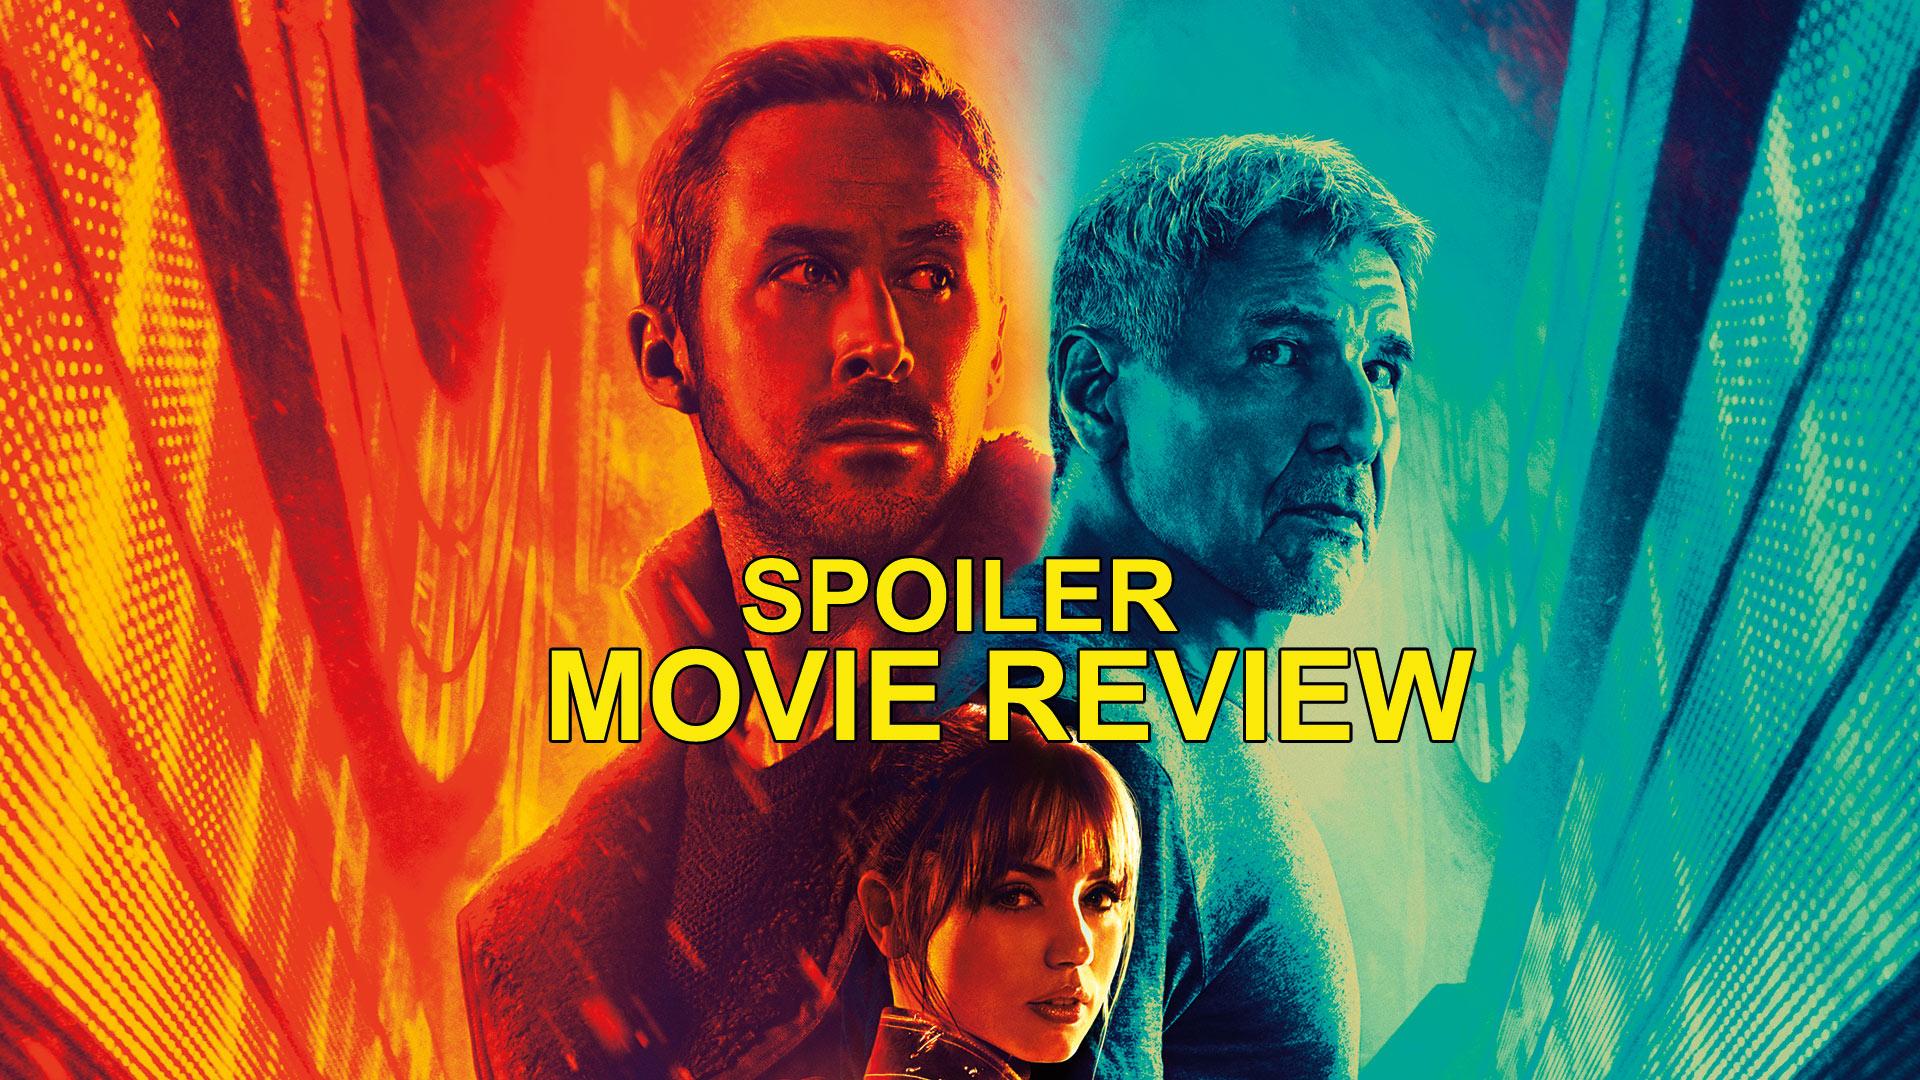 Video: Blade Runner 2049 Movie Review (Spoilers)